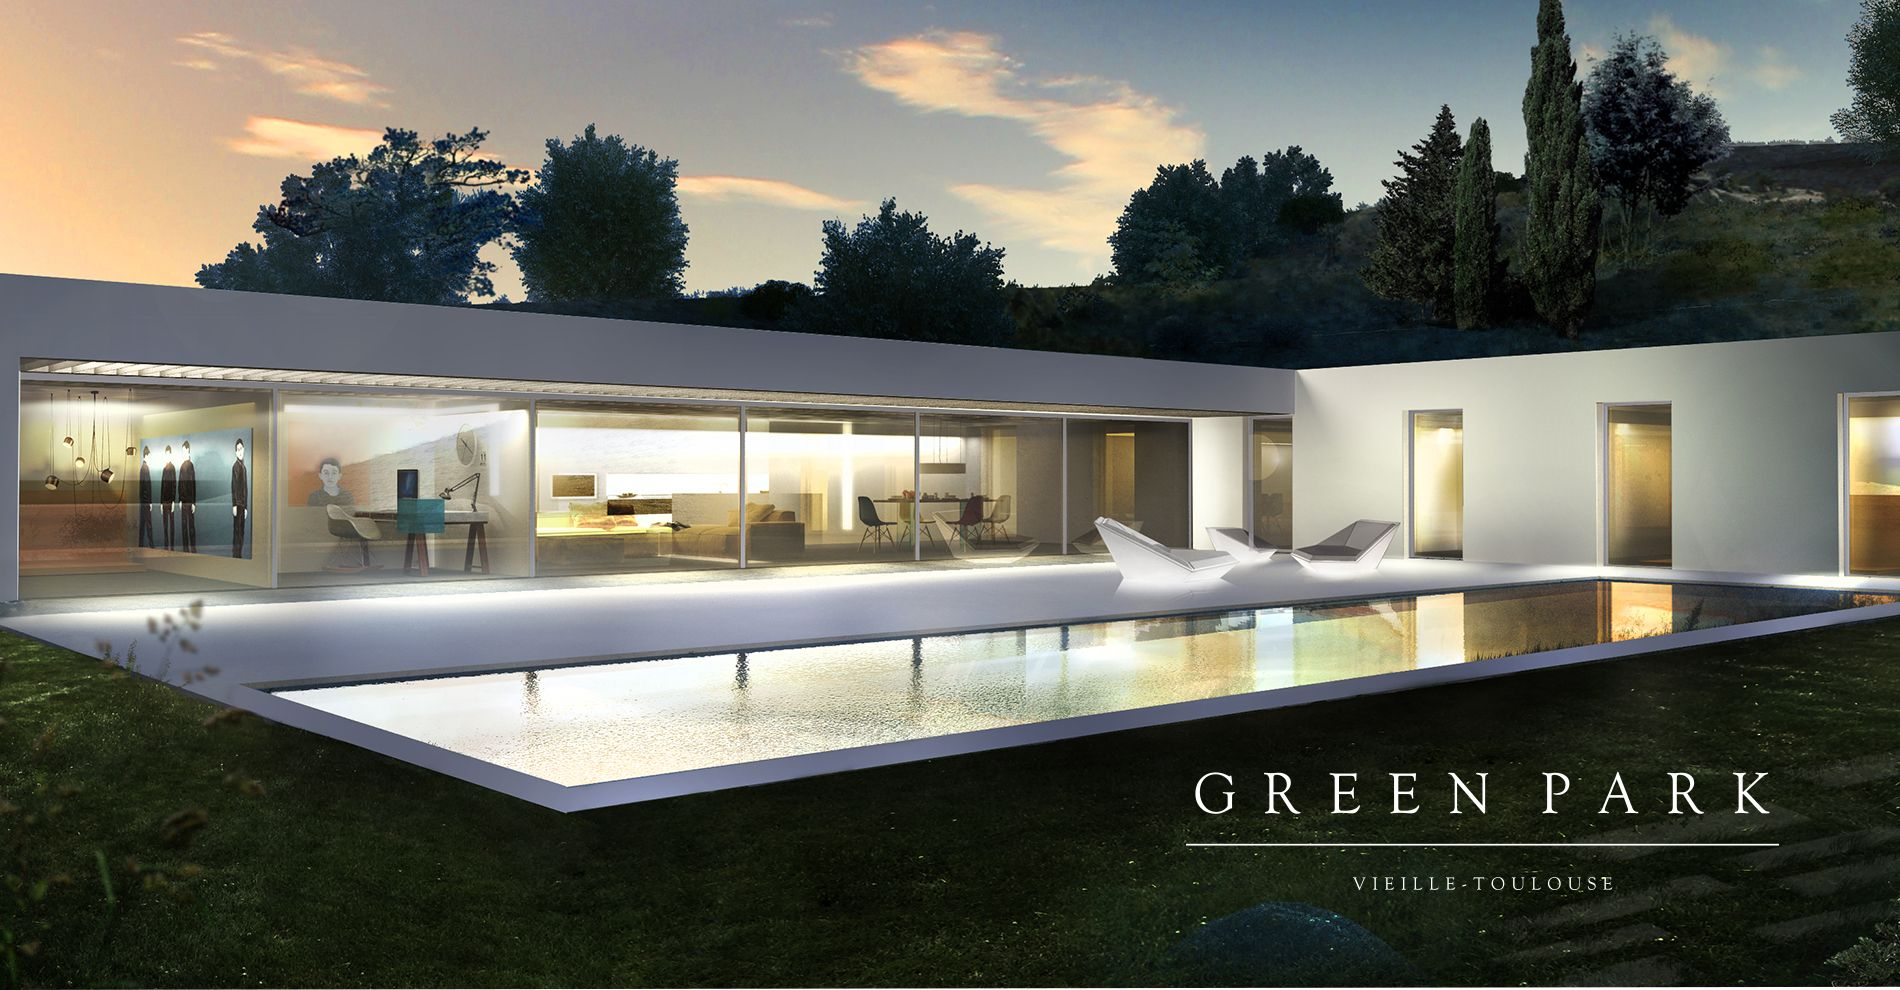 Green Park - Vieille Toulouse - Villa 3